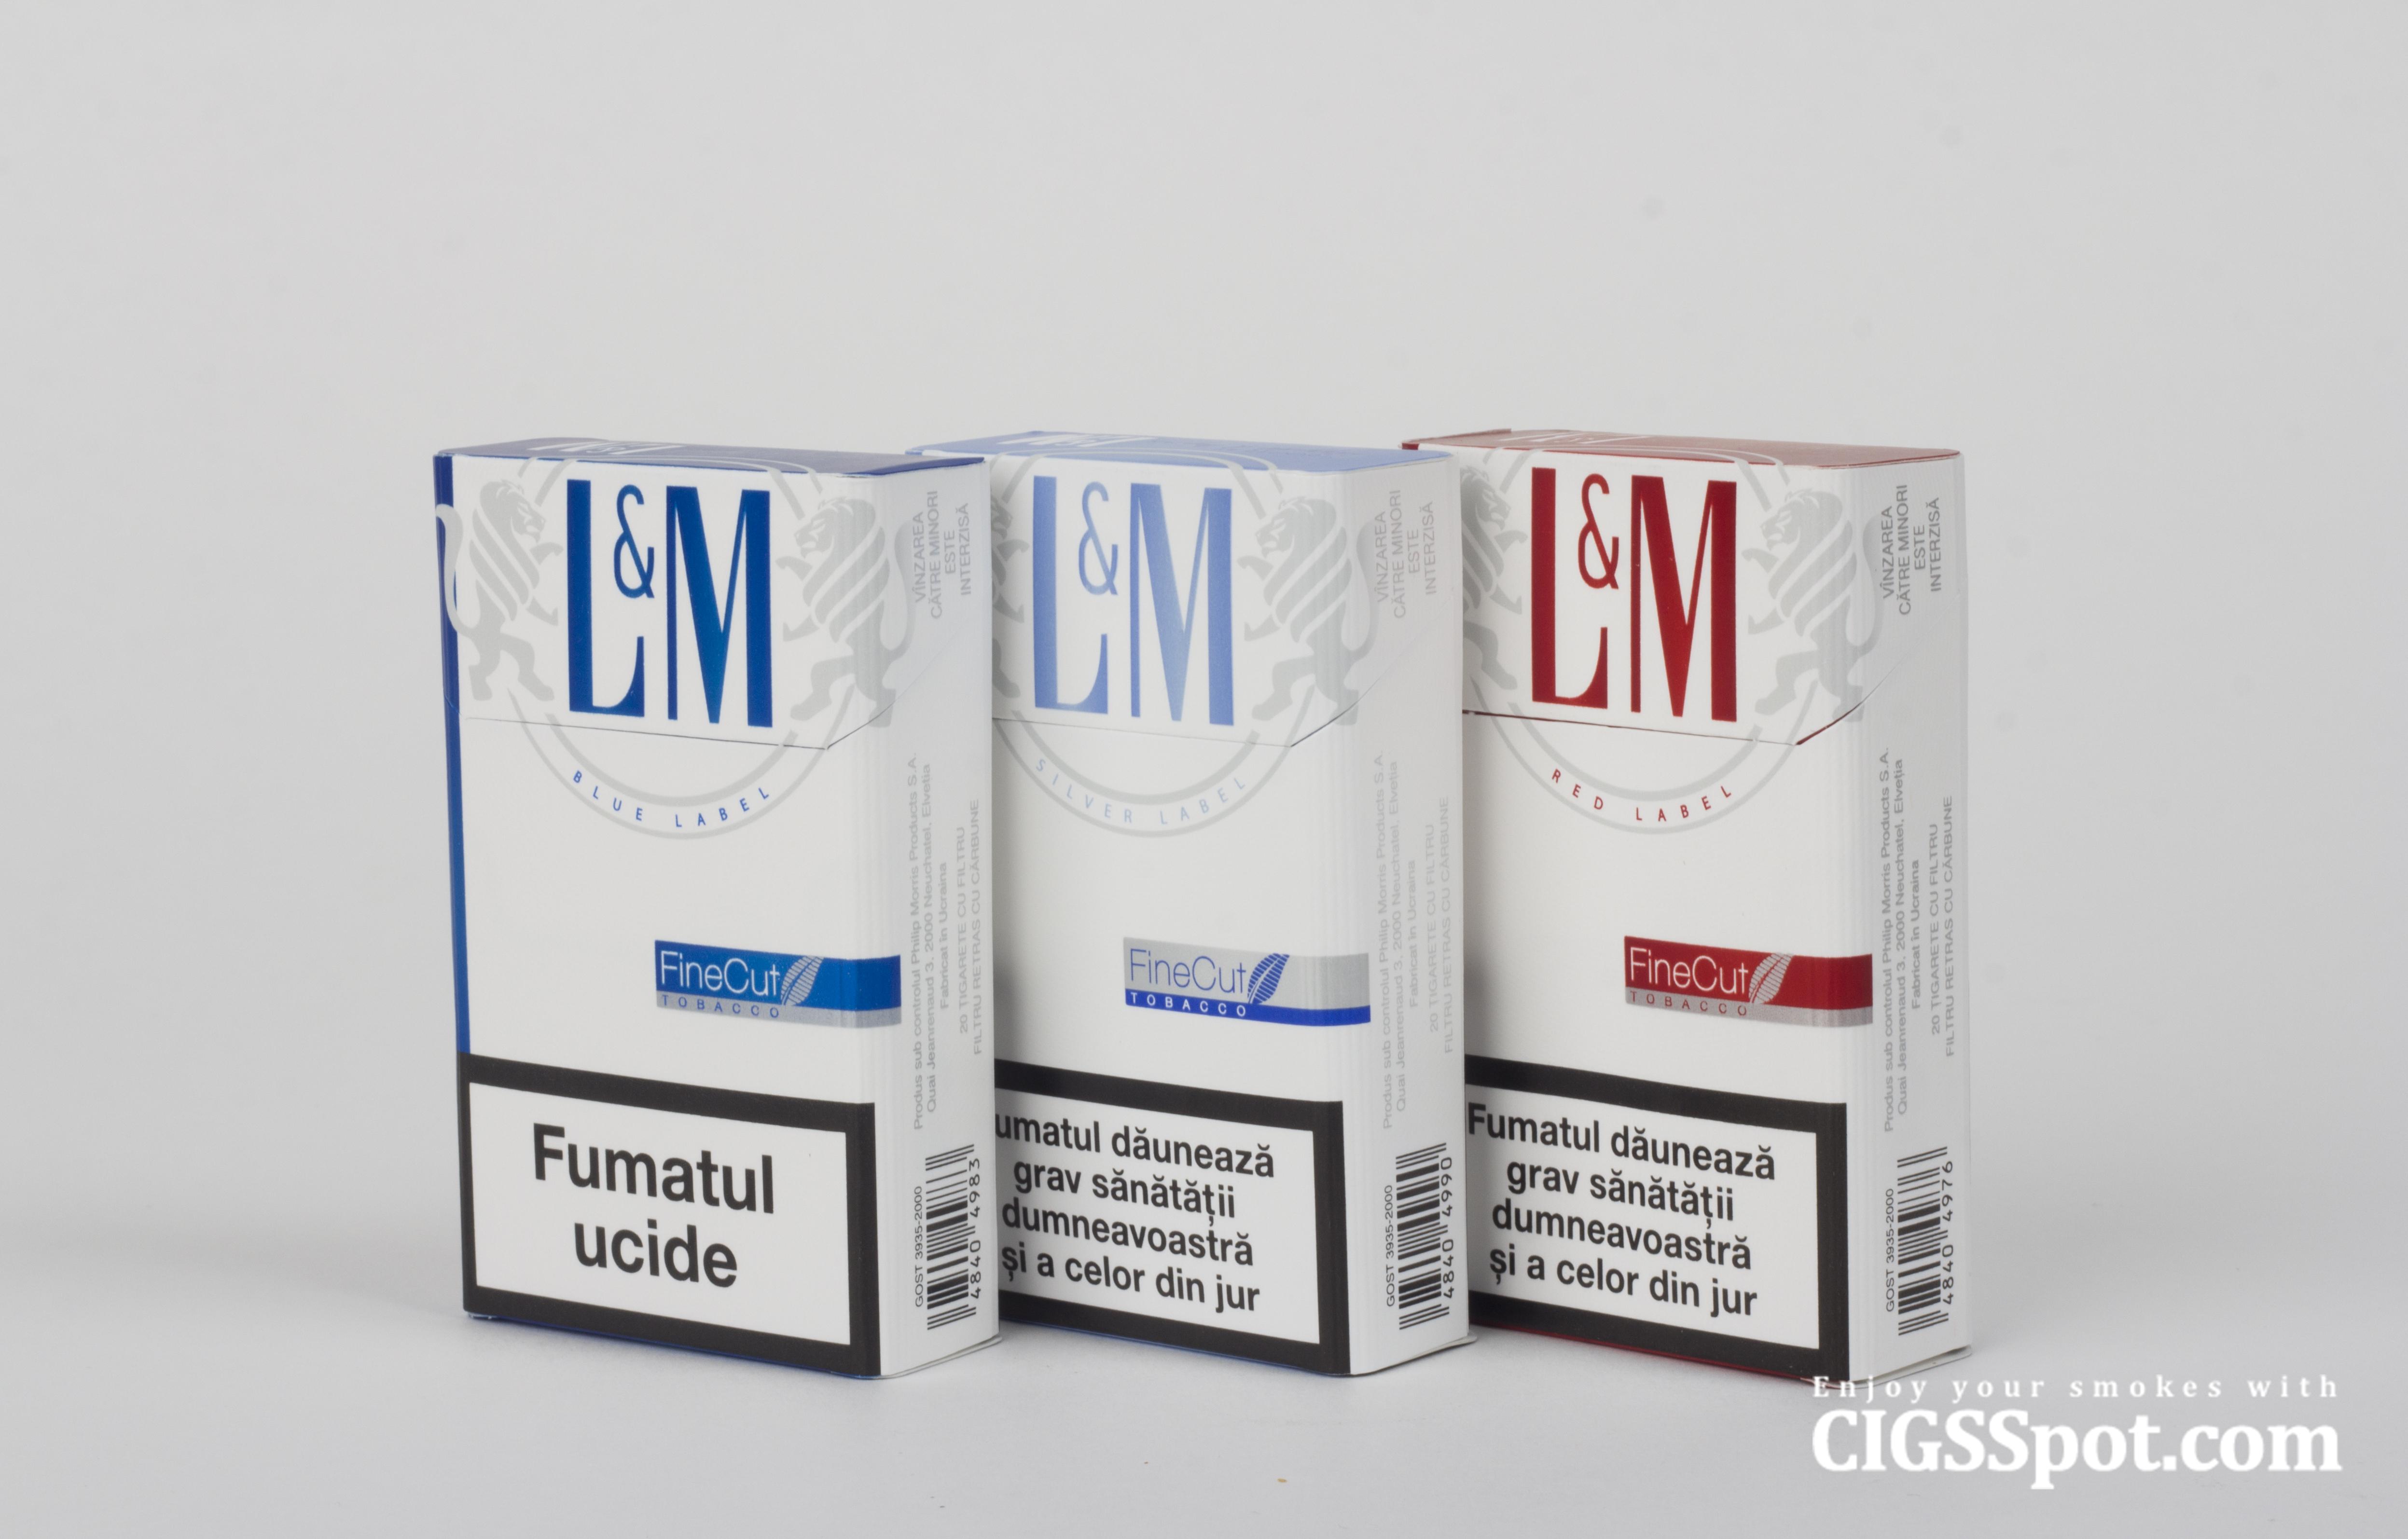 LM Cigarettes